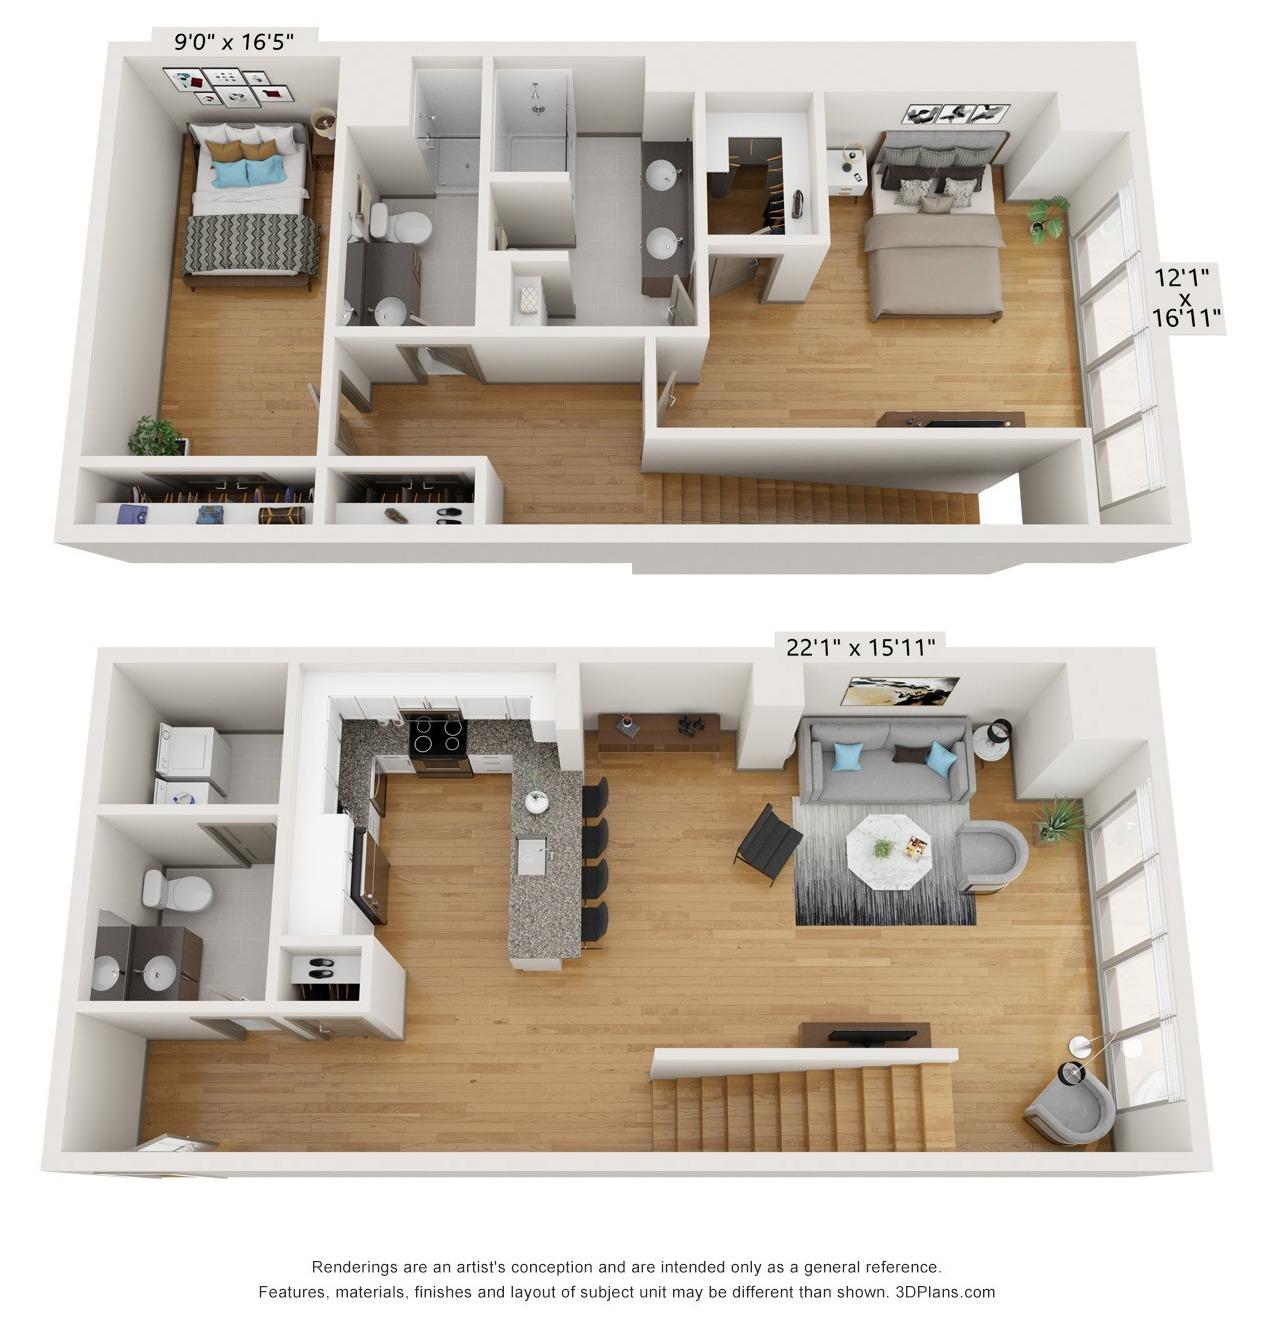 B2L - 2 Bed 2 Bath Duplex - 1,822 SF